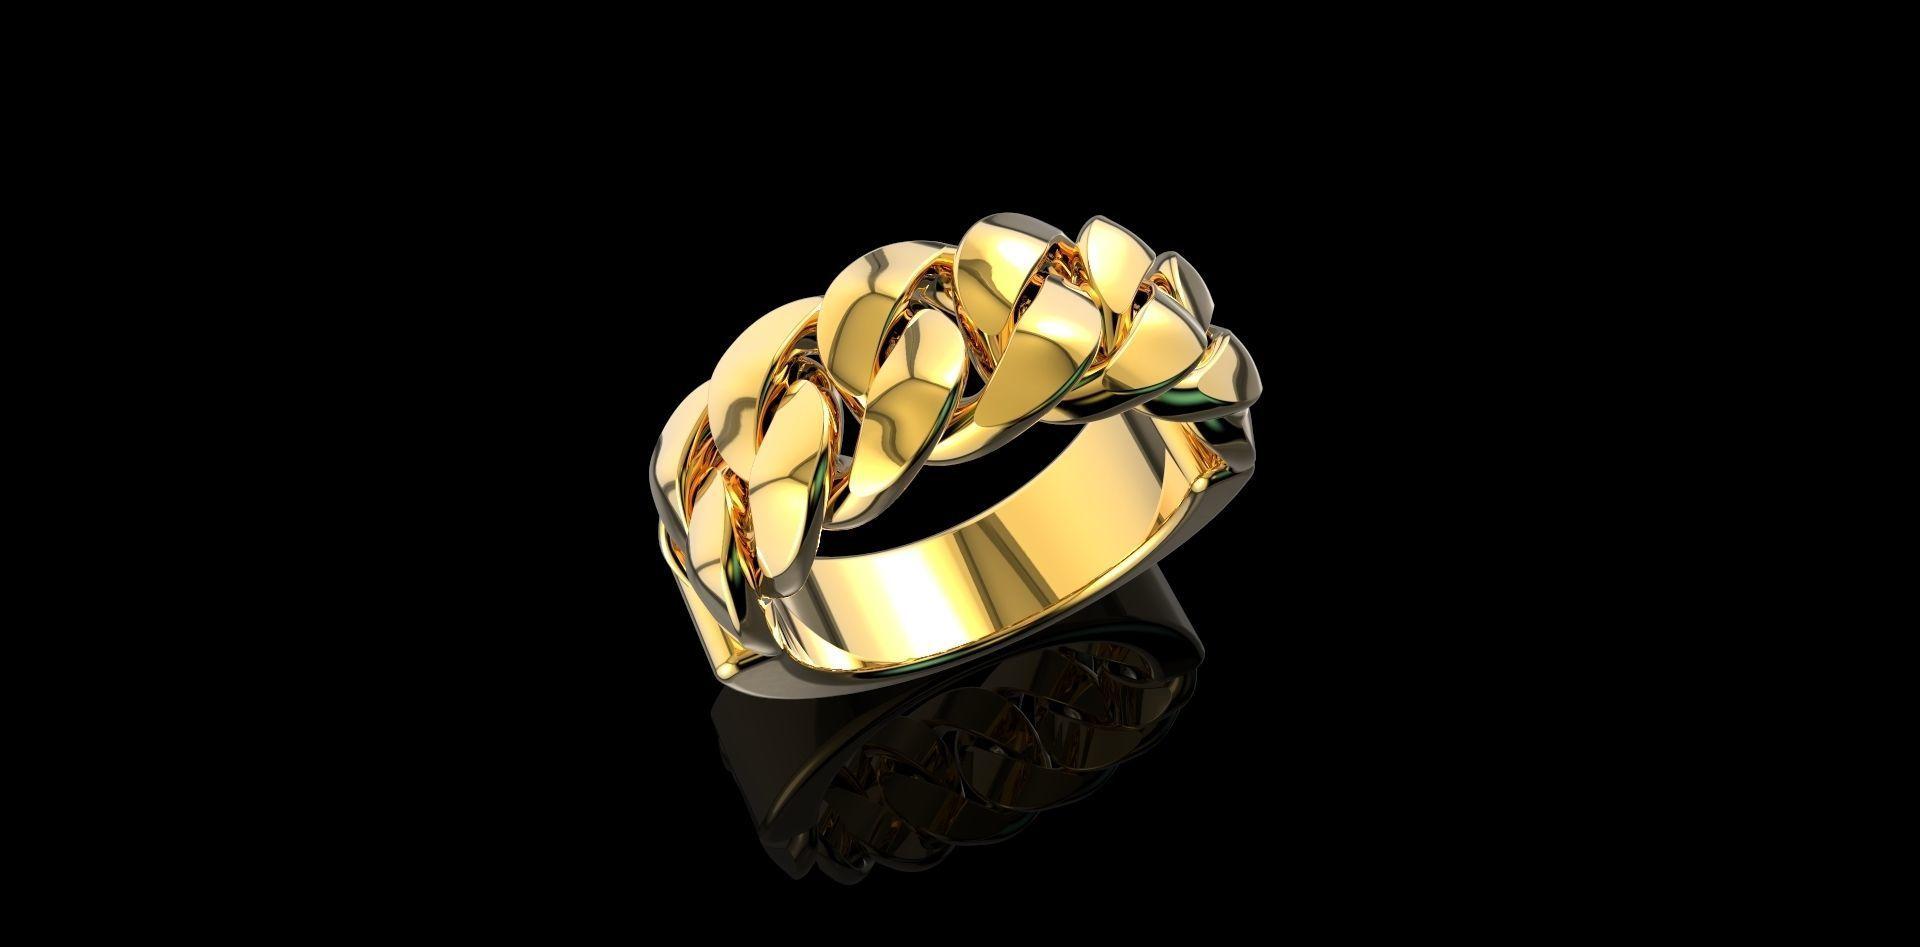 Gold N814